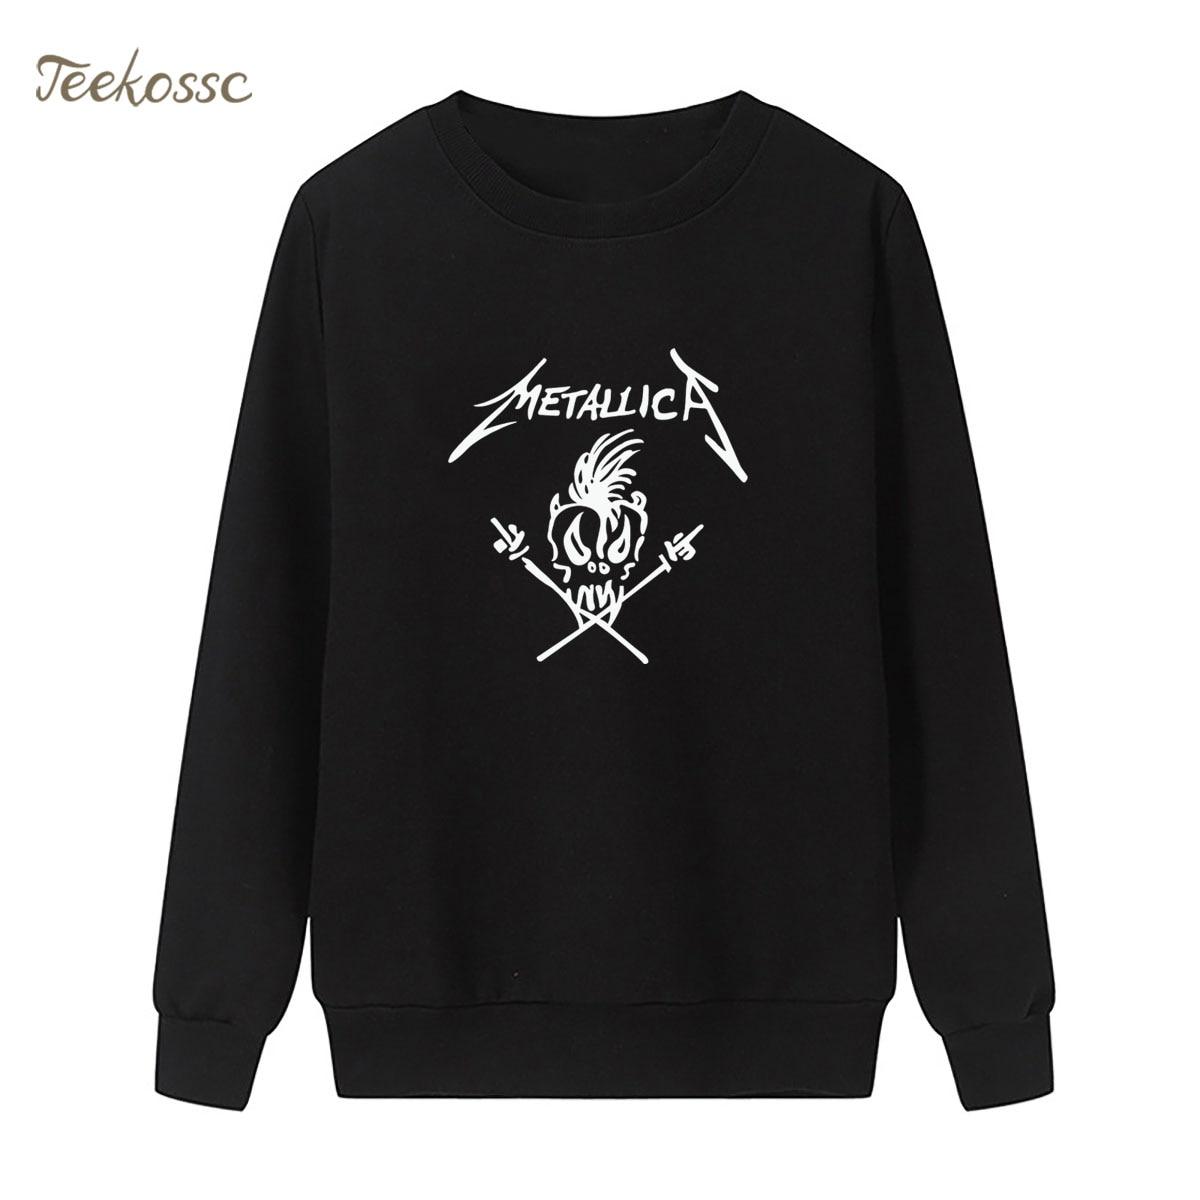 Band Punk Rock Sweatshirt Print Hip Hop Hoodie 2018 Winter Autumn Women Lasdies Pullover Loose Fleece Streetwear Brand Clothing